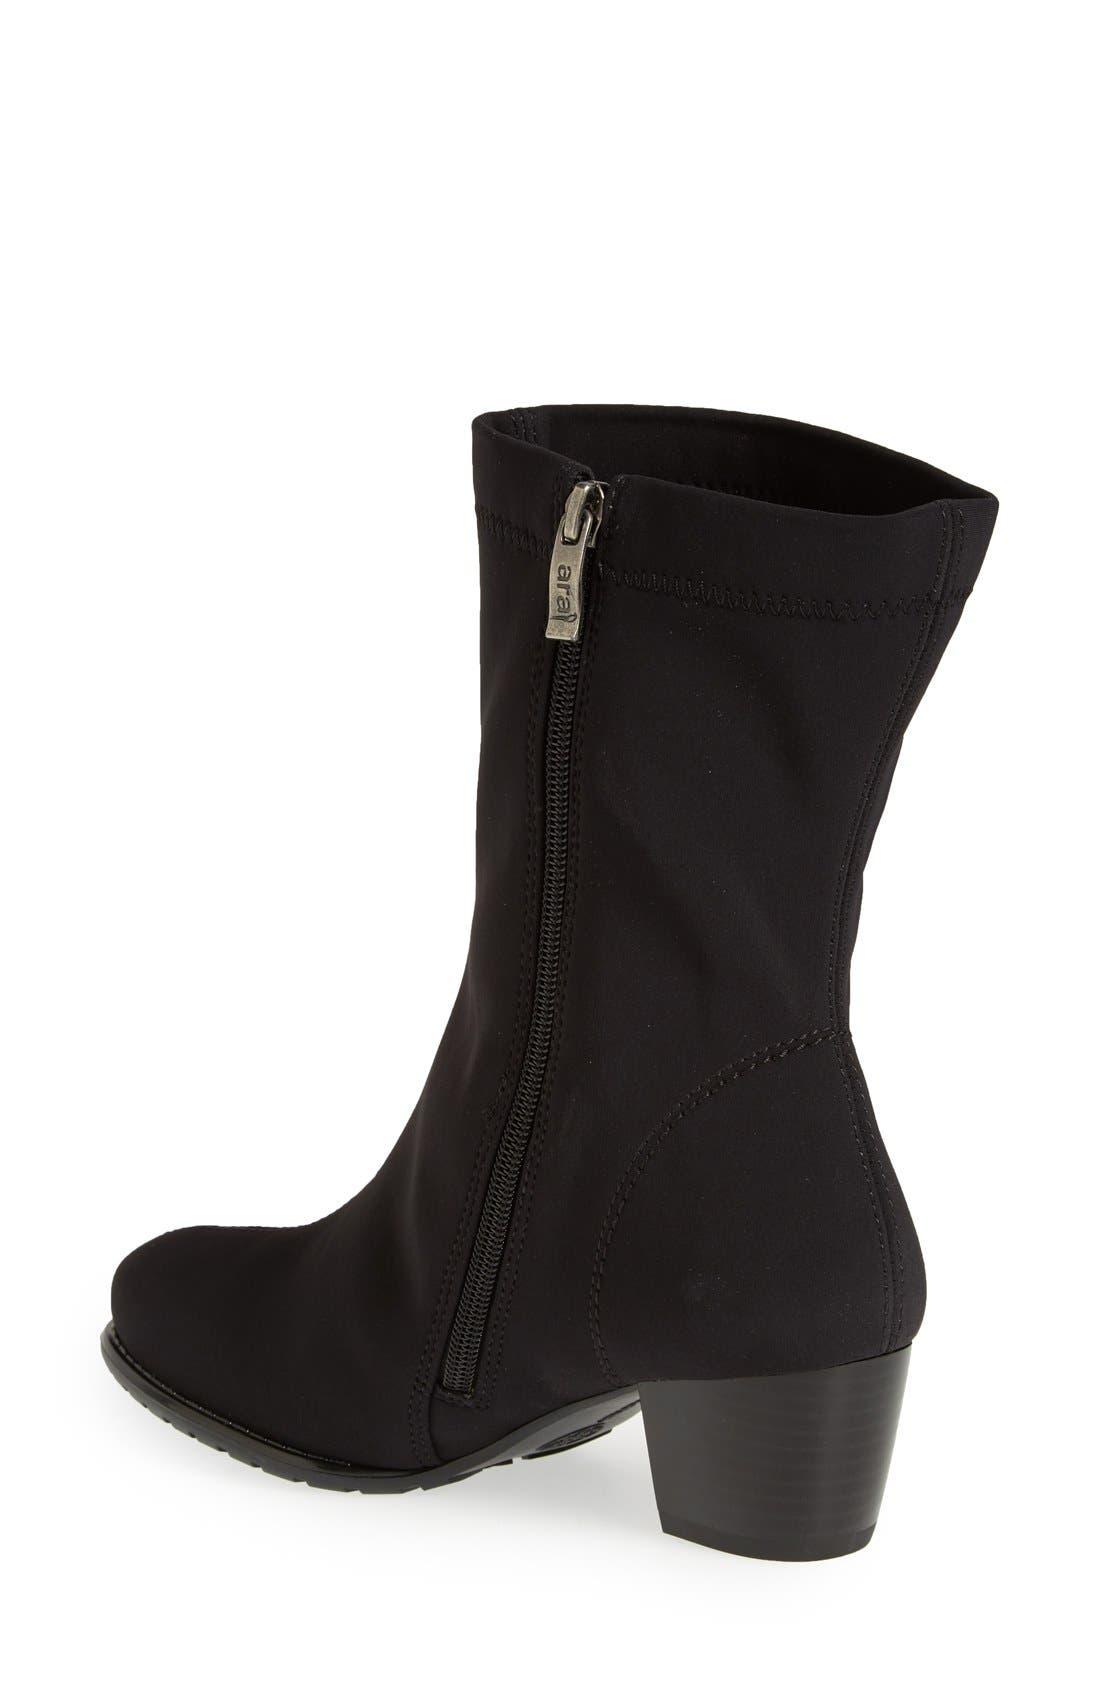 'Fairfax' Waterproof Gore-Tex<sup>®</sup> Block Heel Boot,                             Alternate thumbnail 3, color,                             001